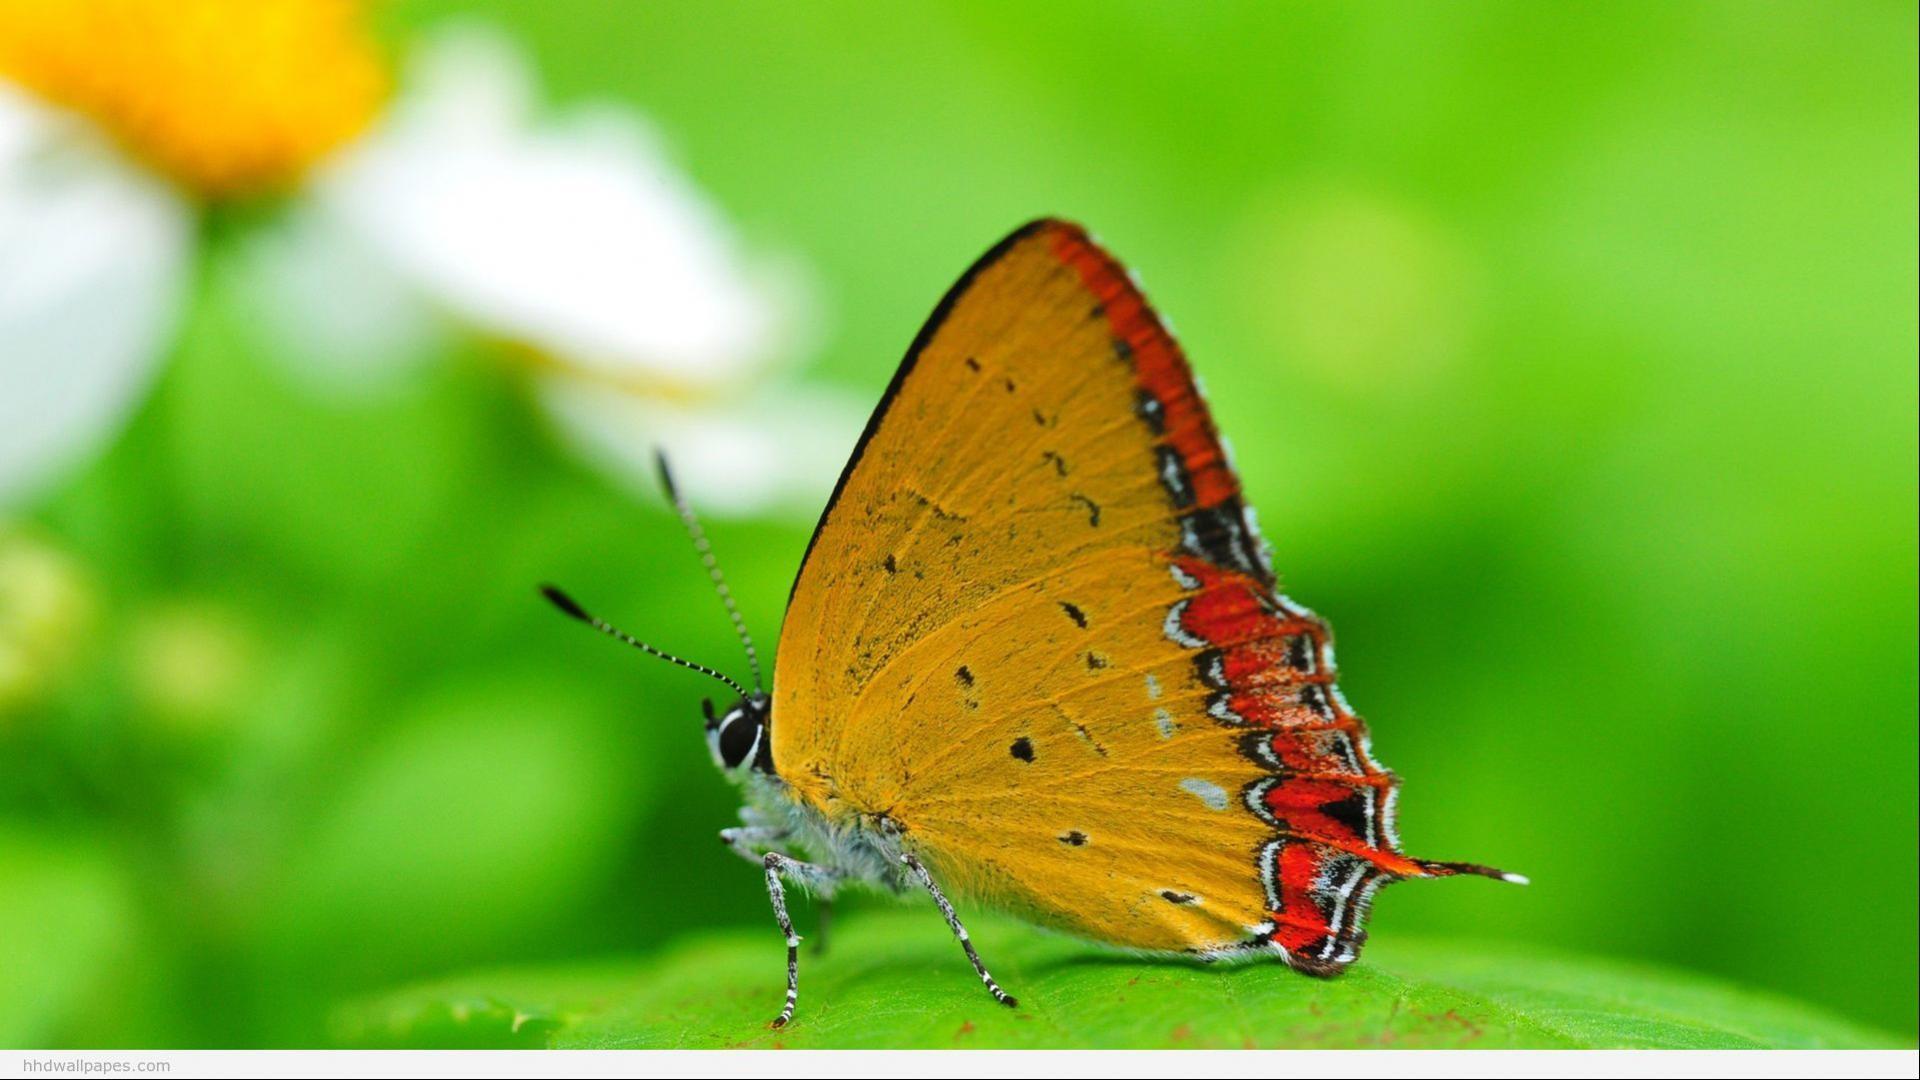 Full HD Nature Wallpapers 1080p Desktop with Macro Photo of .